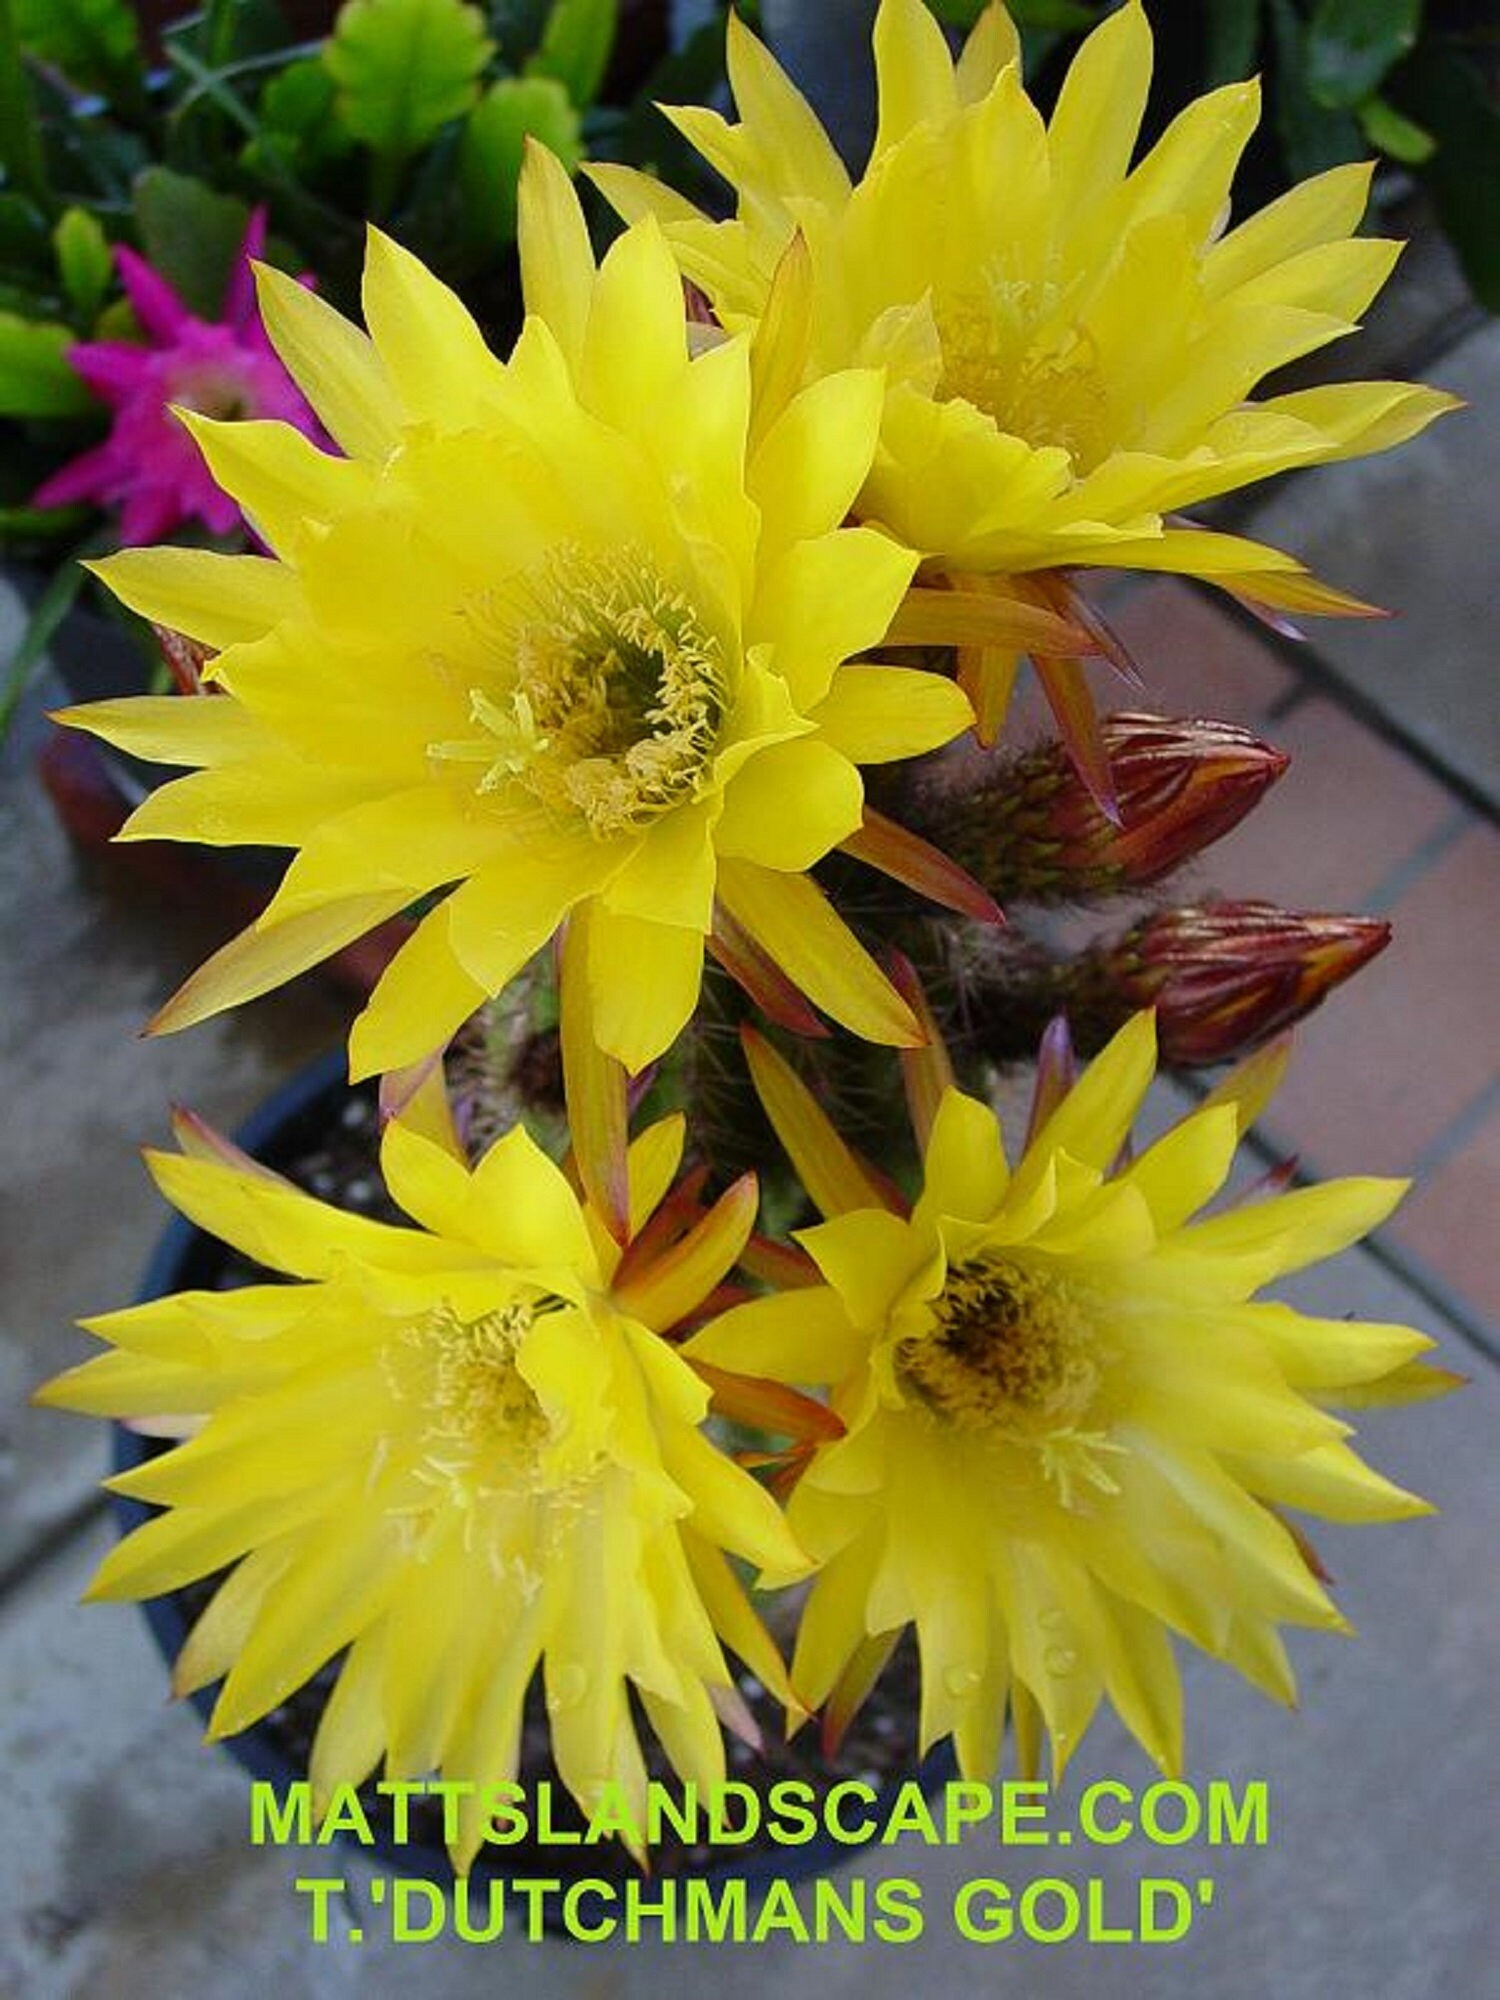 Trichocereus, Trichocereus, Trichocereus, hybride, «DUTCHMANS GOLD», plantes, Cactus, Blooming taille, Echinposis, Lobivia 3662e5